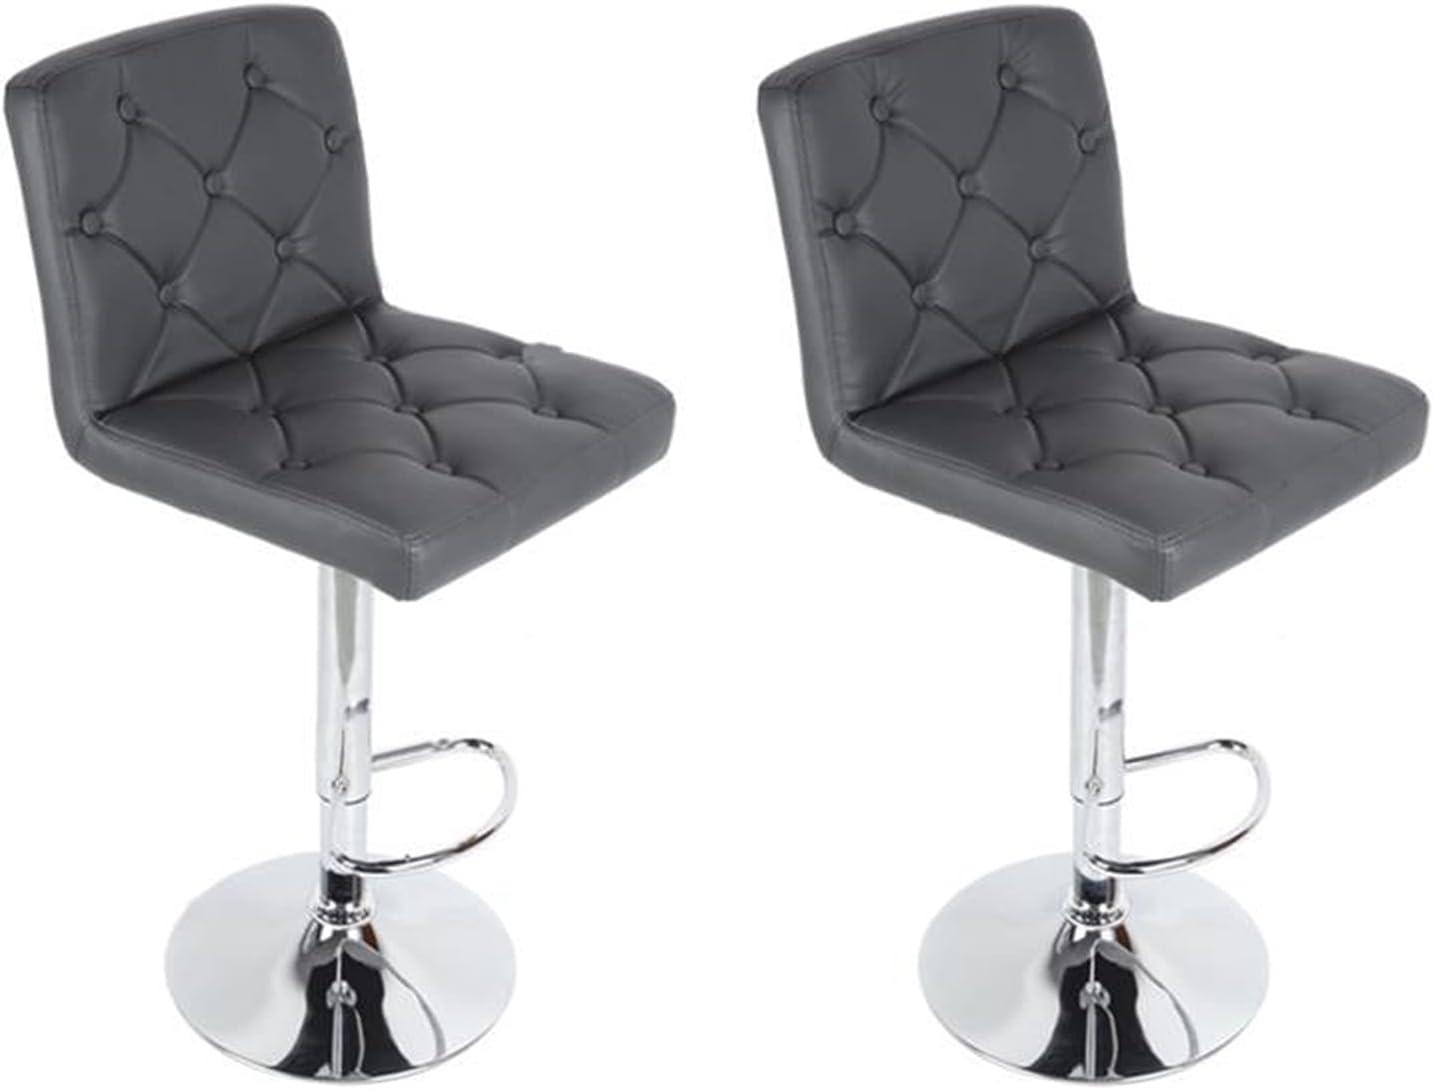 paritariny Manufacturer OFFicial shop Bar Stools Chairs 2pcs Gas B Adjustable Lift Set Max 87% OFF